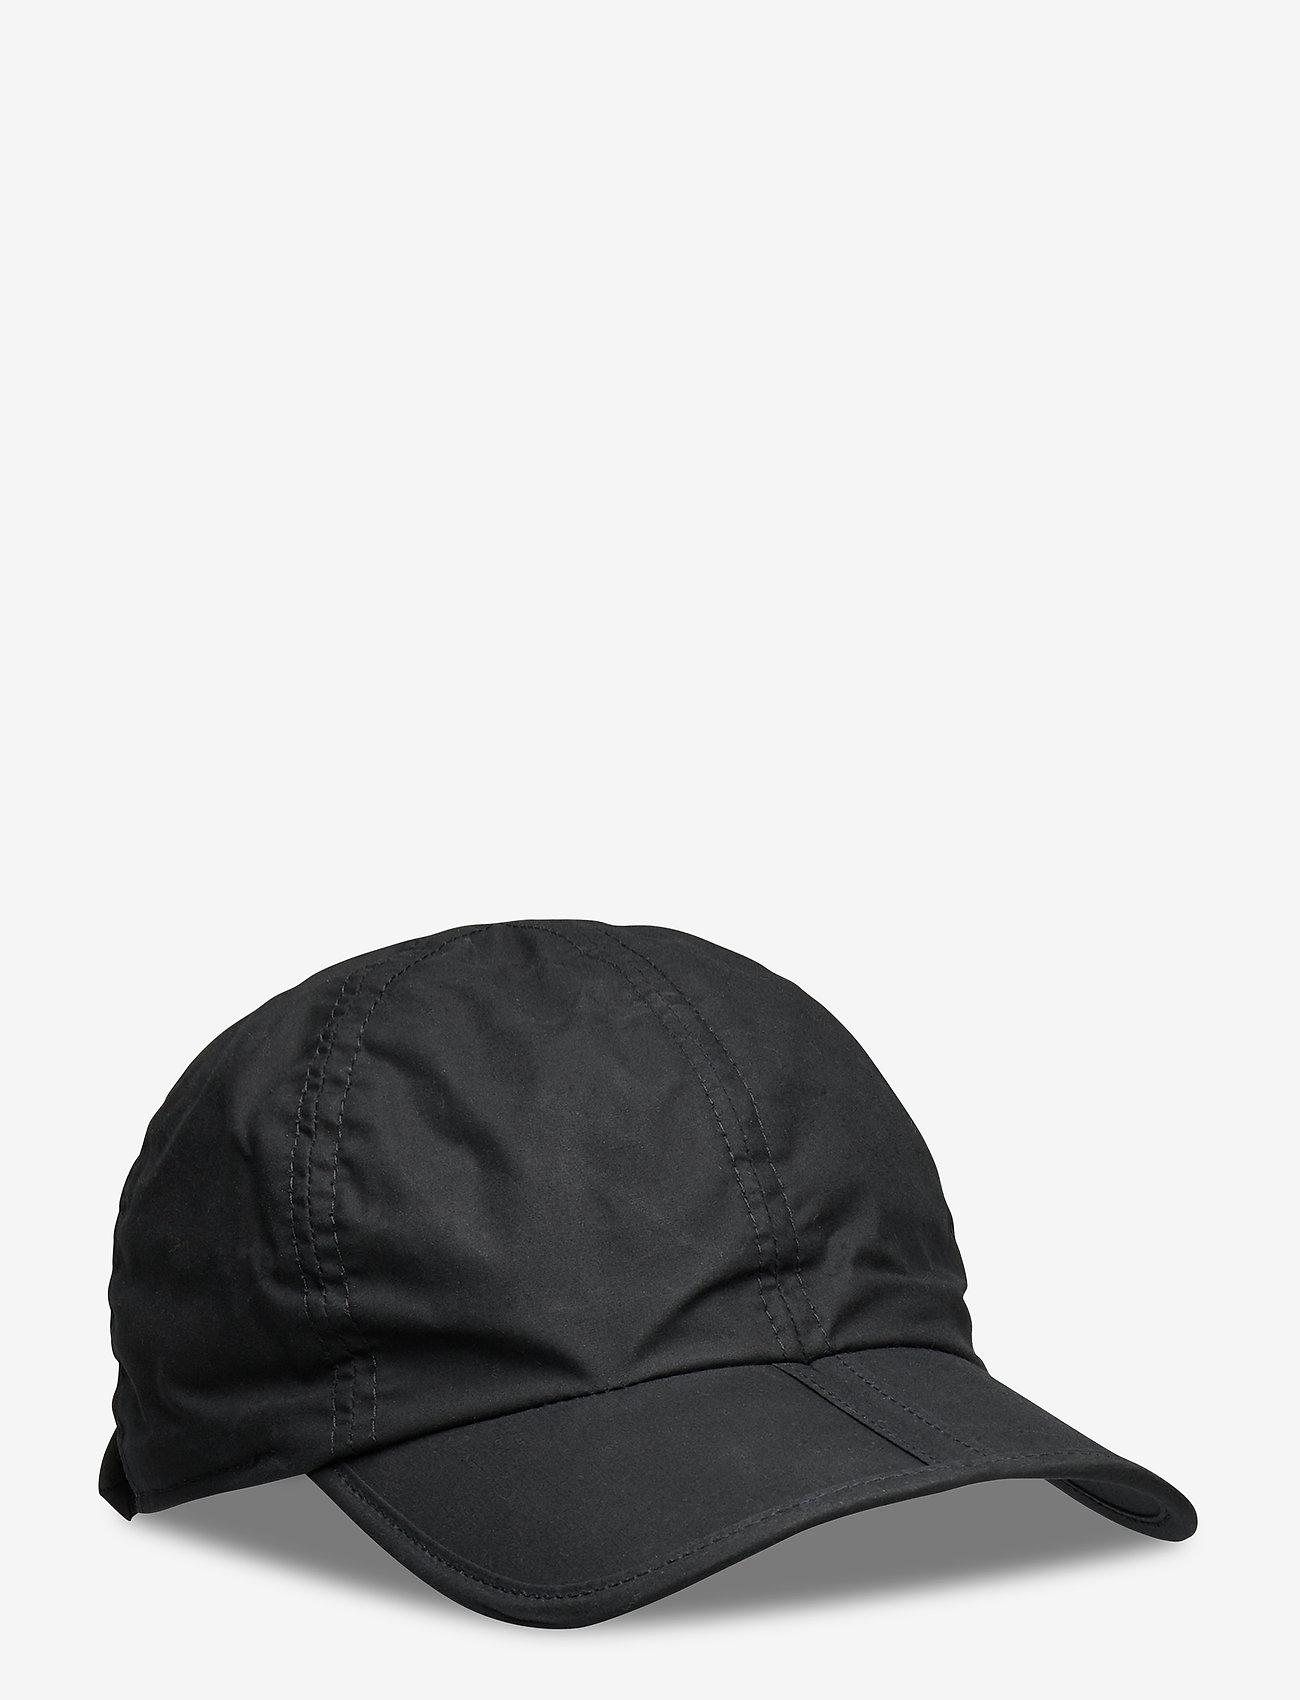 Wigéns - Baseball Cap - kasketter - black - 0